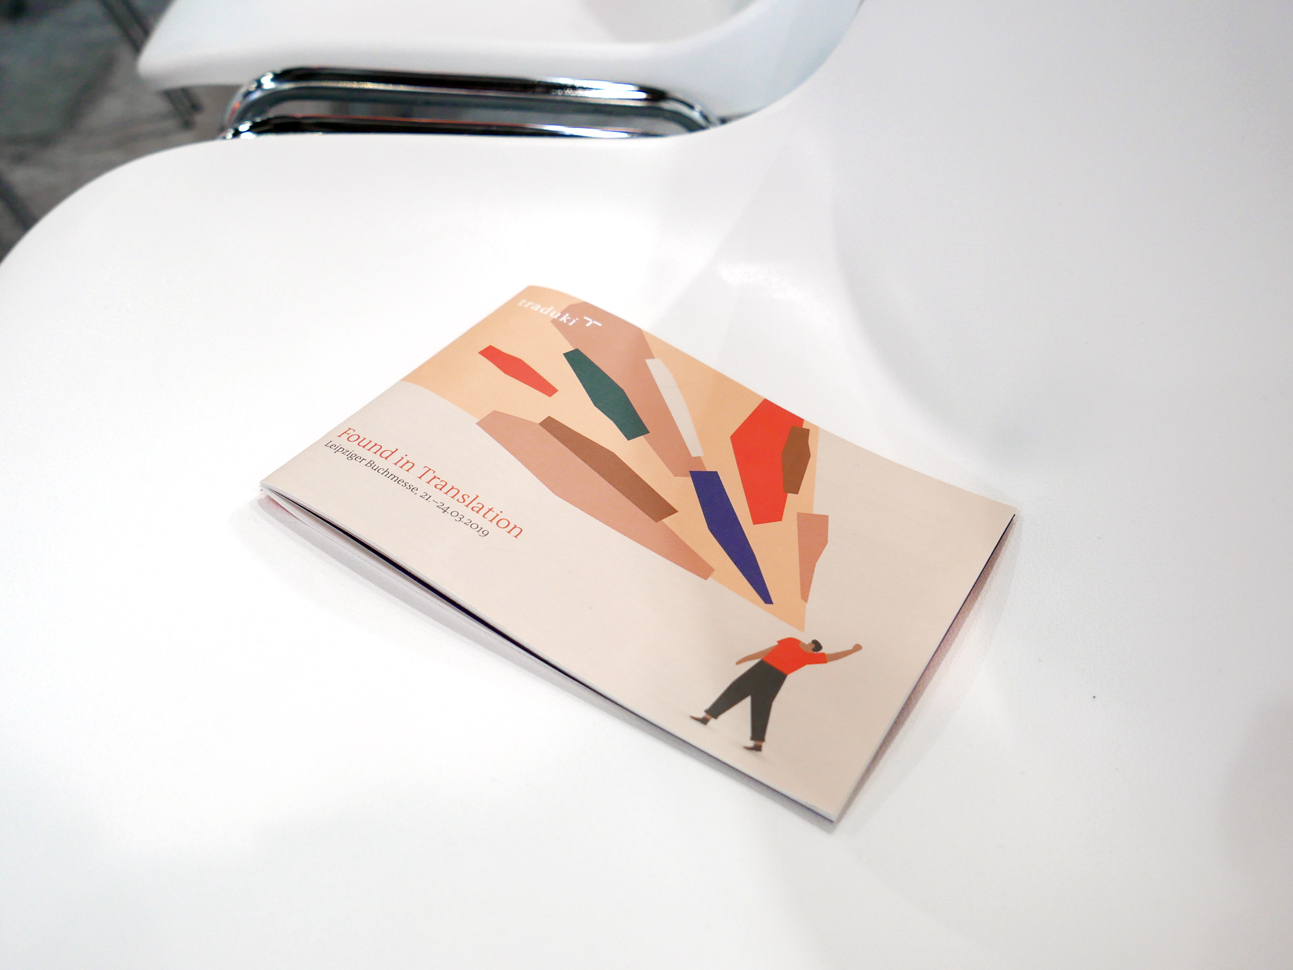 martin zech design, projekt design, traduki, messestand, leipziger buchmesse, 2019, programmheft, titel